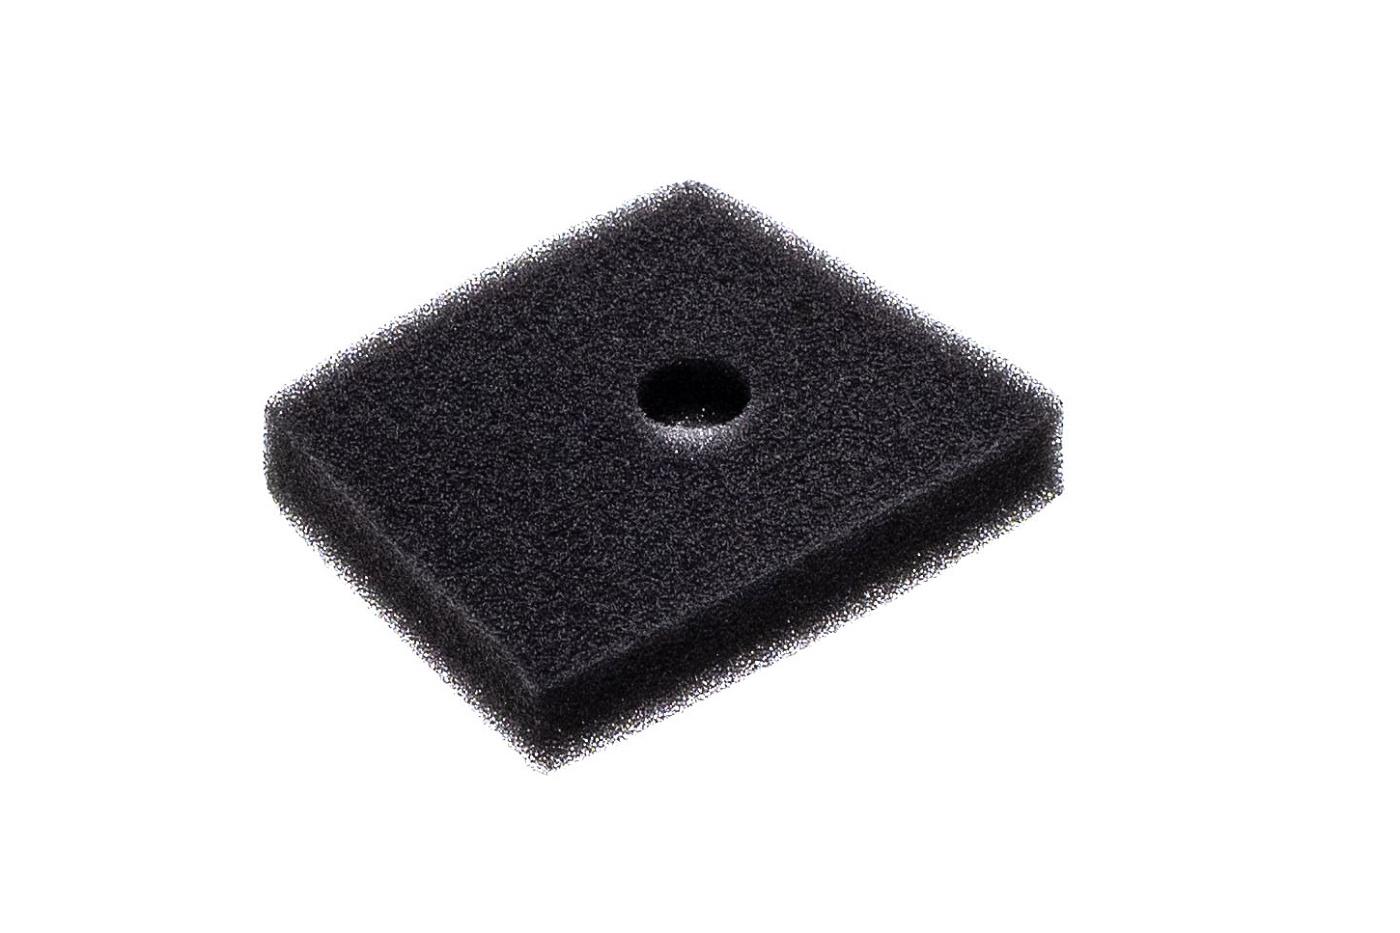 Vzduchový filter Husqvarna - 537 18 63-01